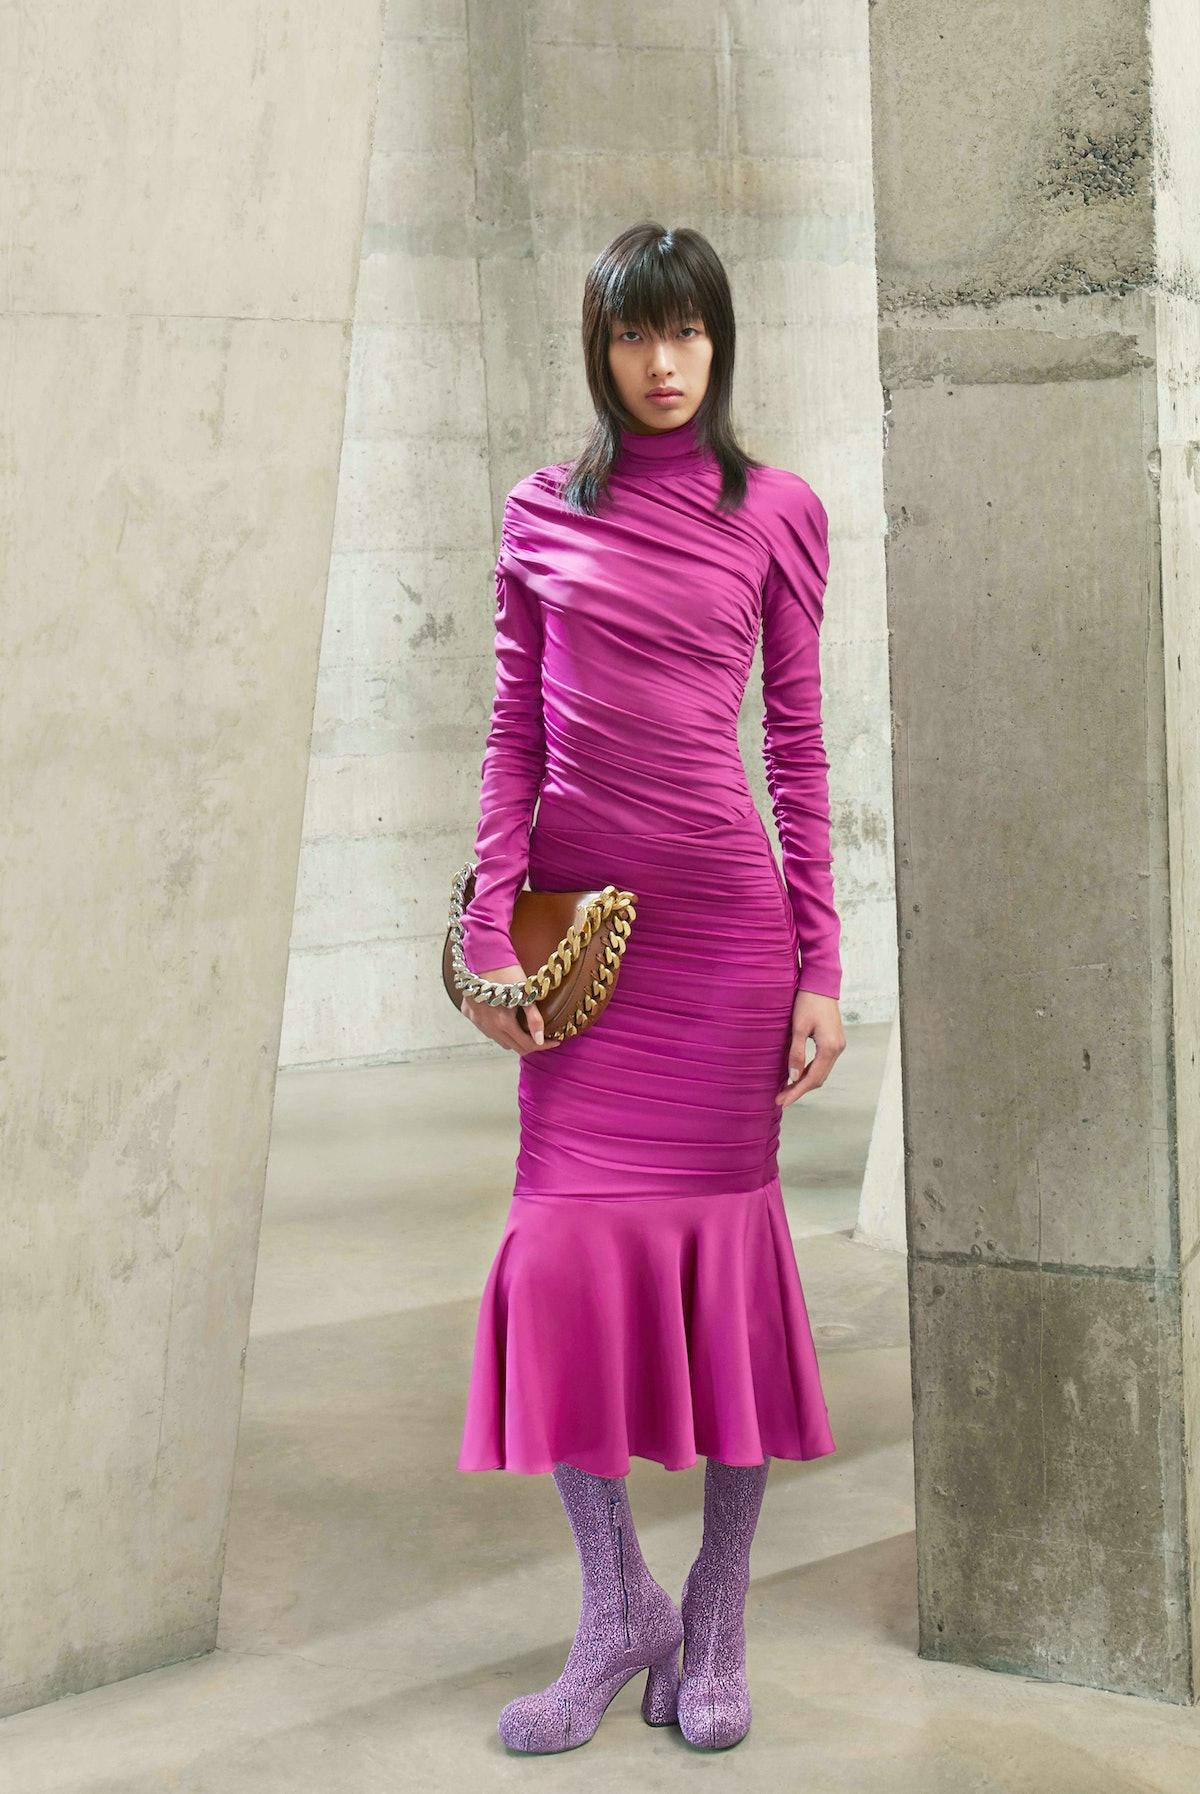 Model in pink turtleneck dress